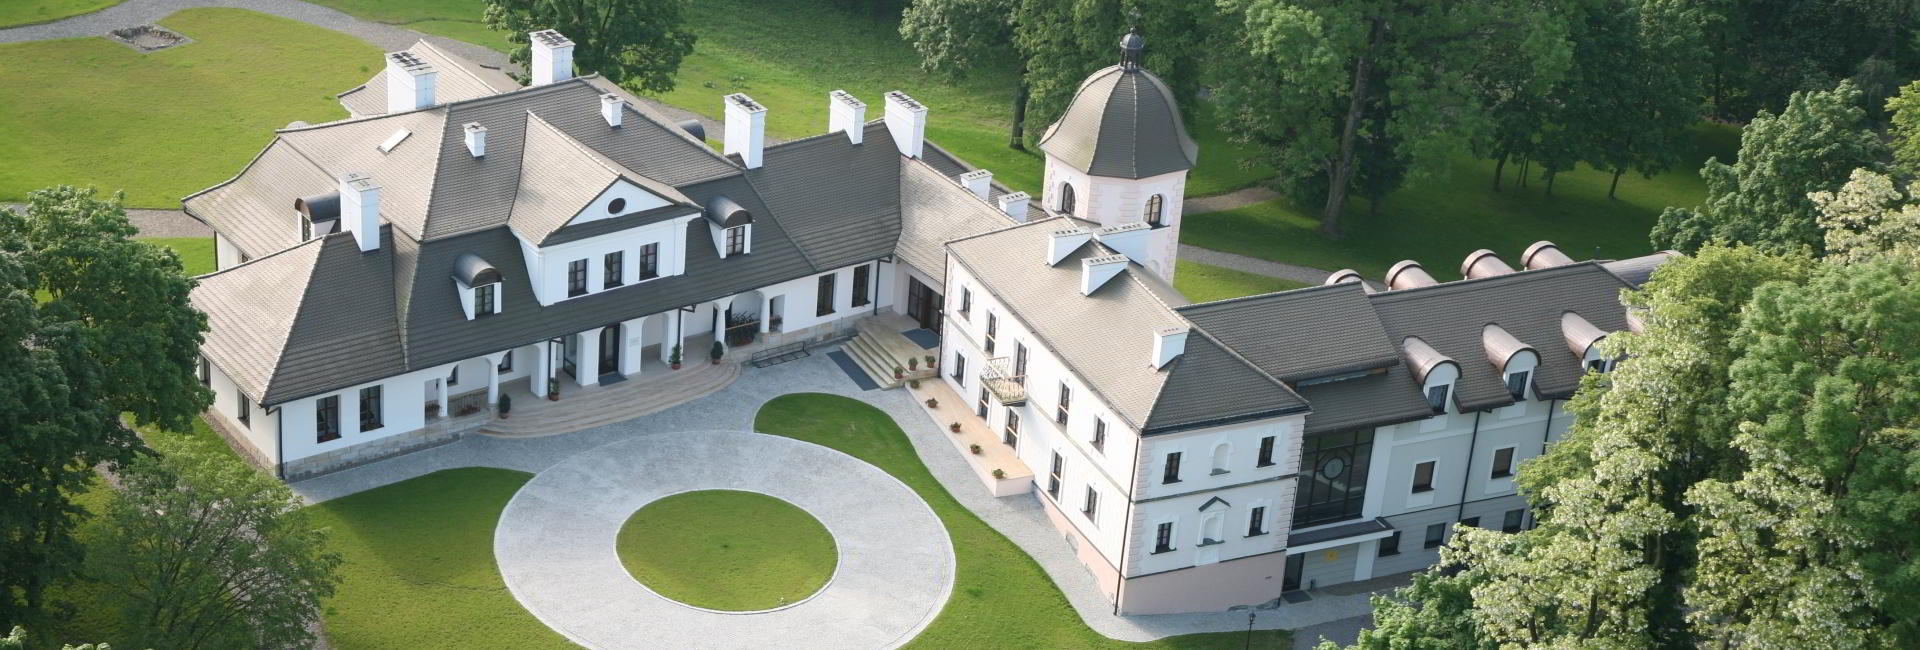 Kombornia Manor, Subcarpathia Province, Poland